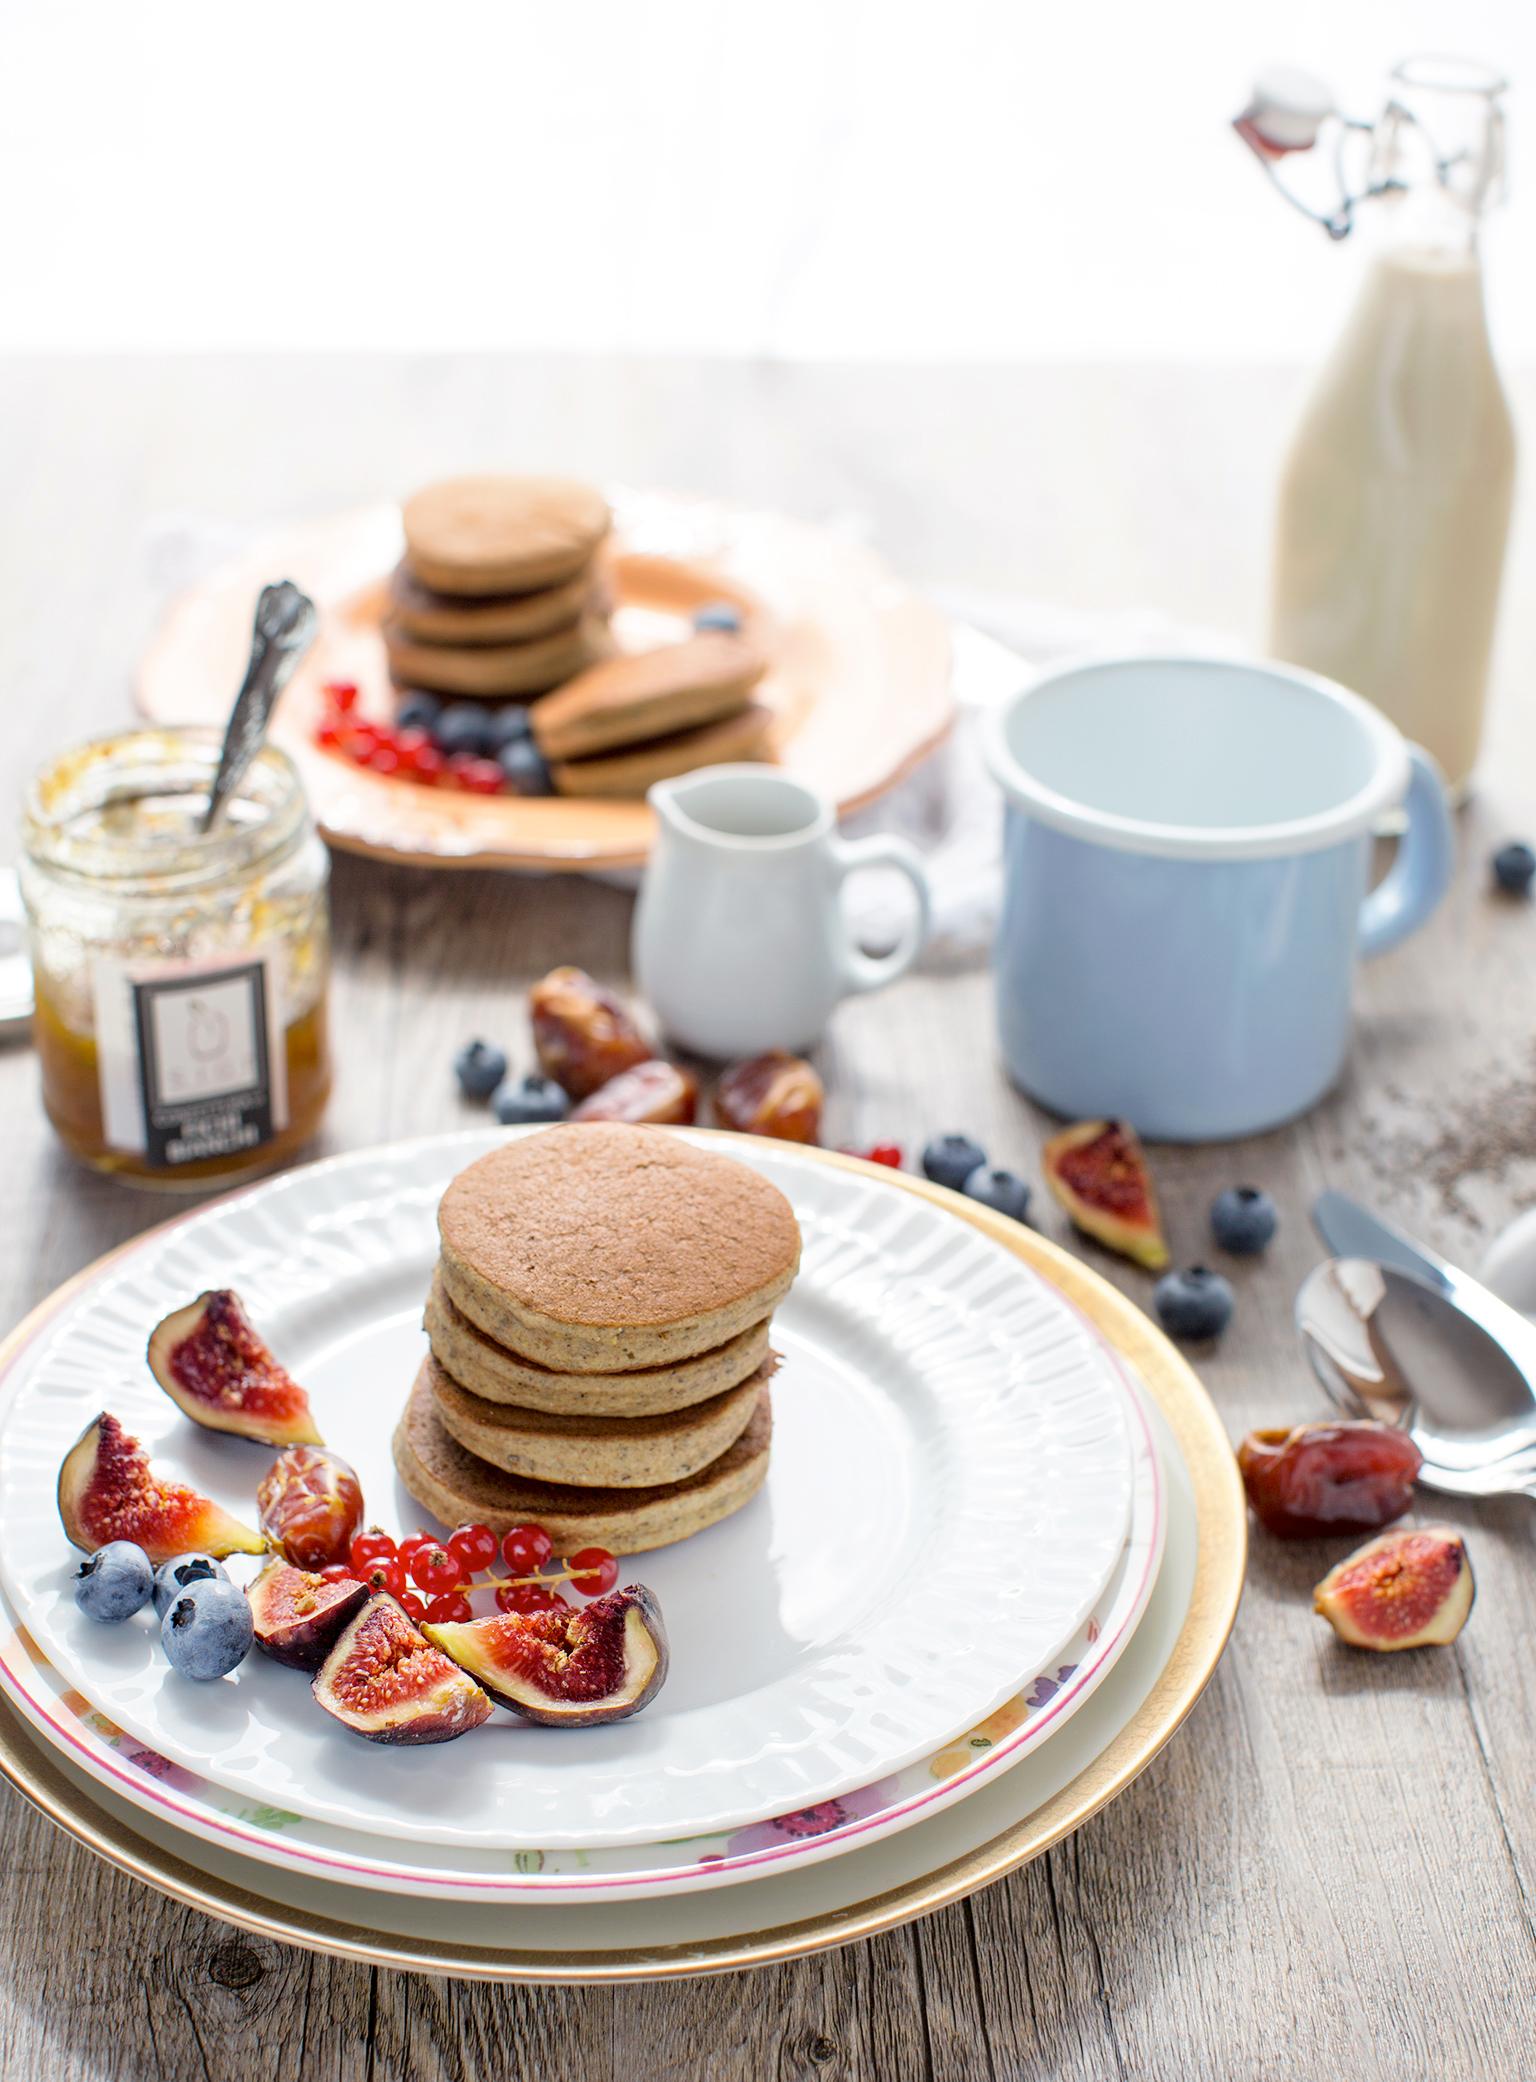 pancakes al grano saraceno vegan senza glutine con marmellata di fichi | vegan glutenfree buckwheat pancakes with figs jam